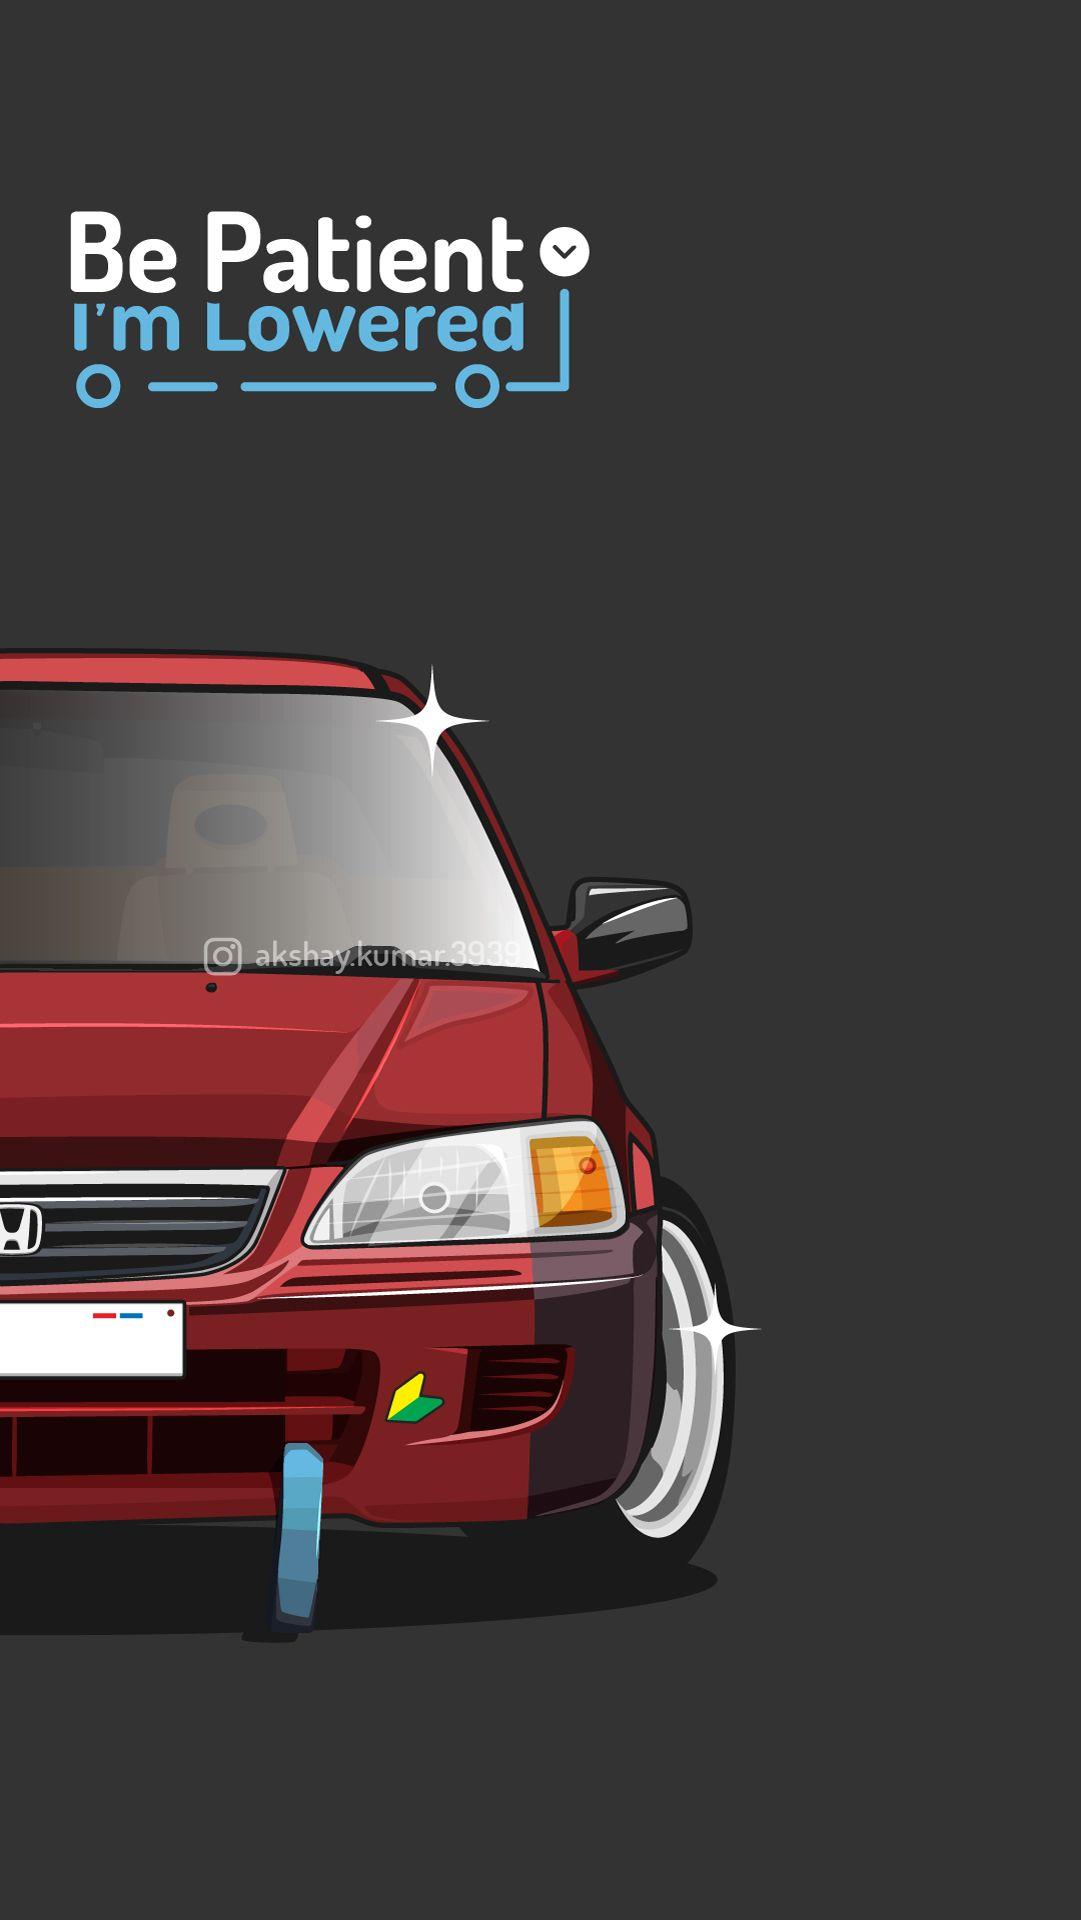 Honda City Wallpaper Indian Cars Wallpaper Vector Art Jdm Wallpaper Honda Civic Mobil Honda